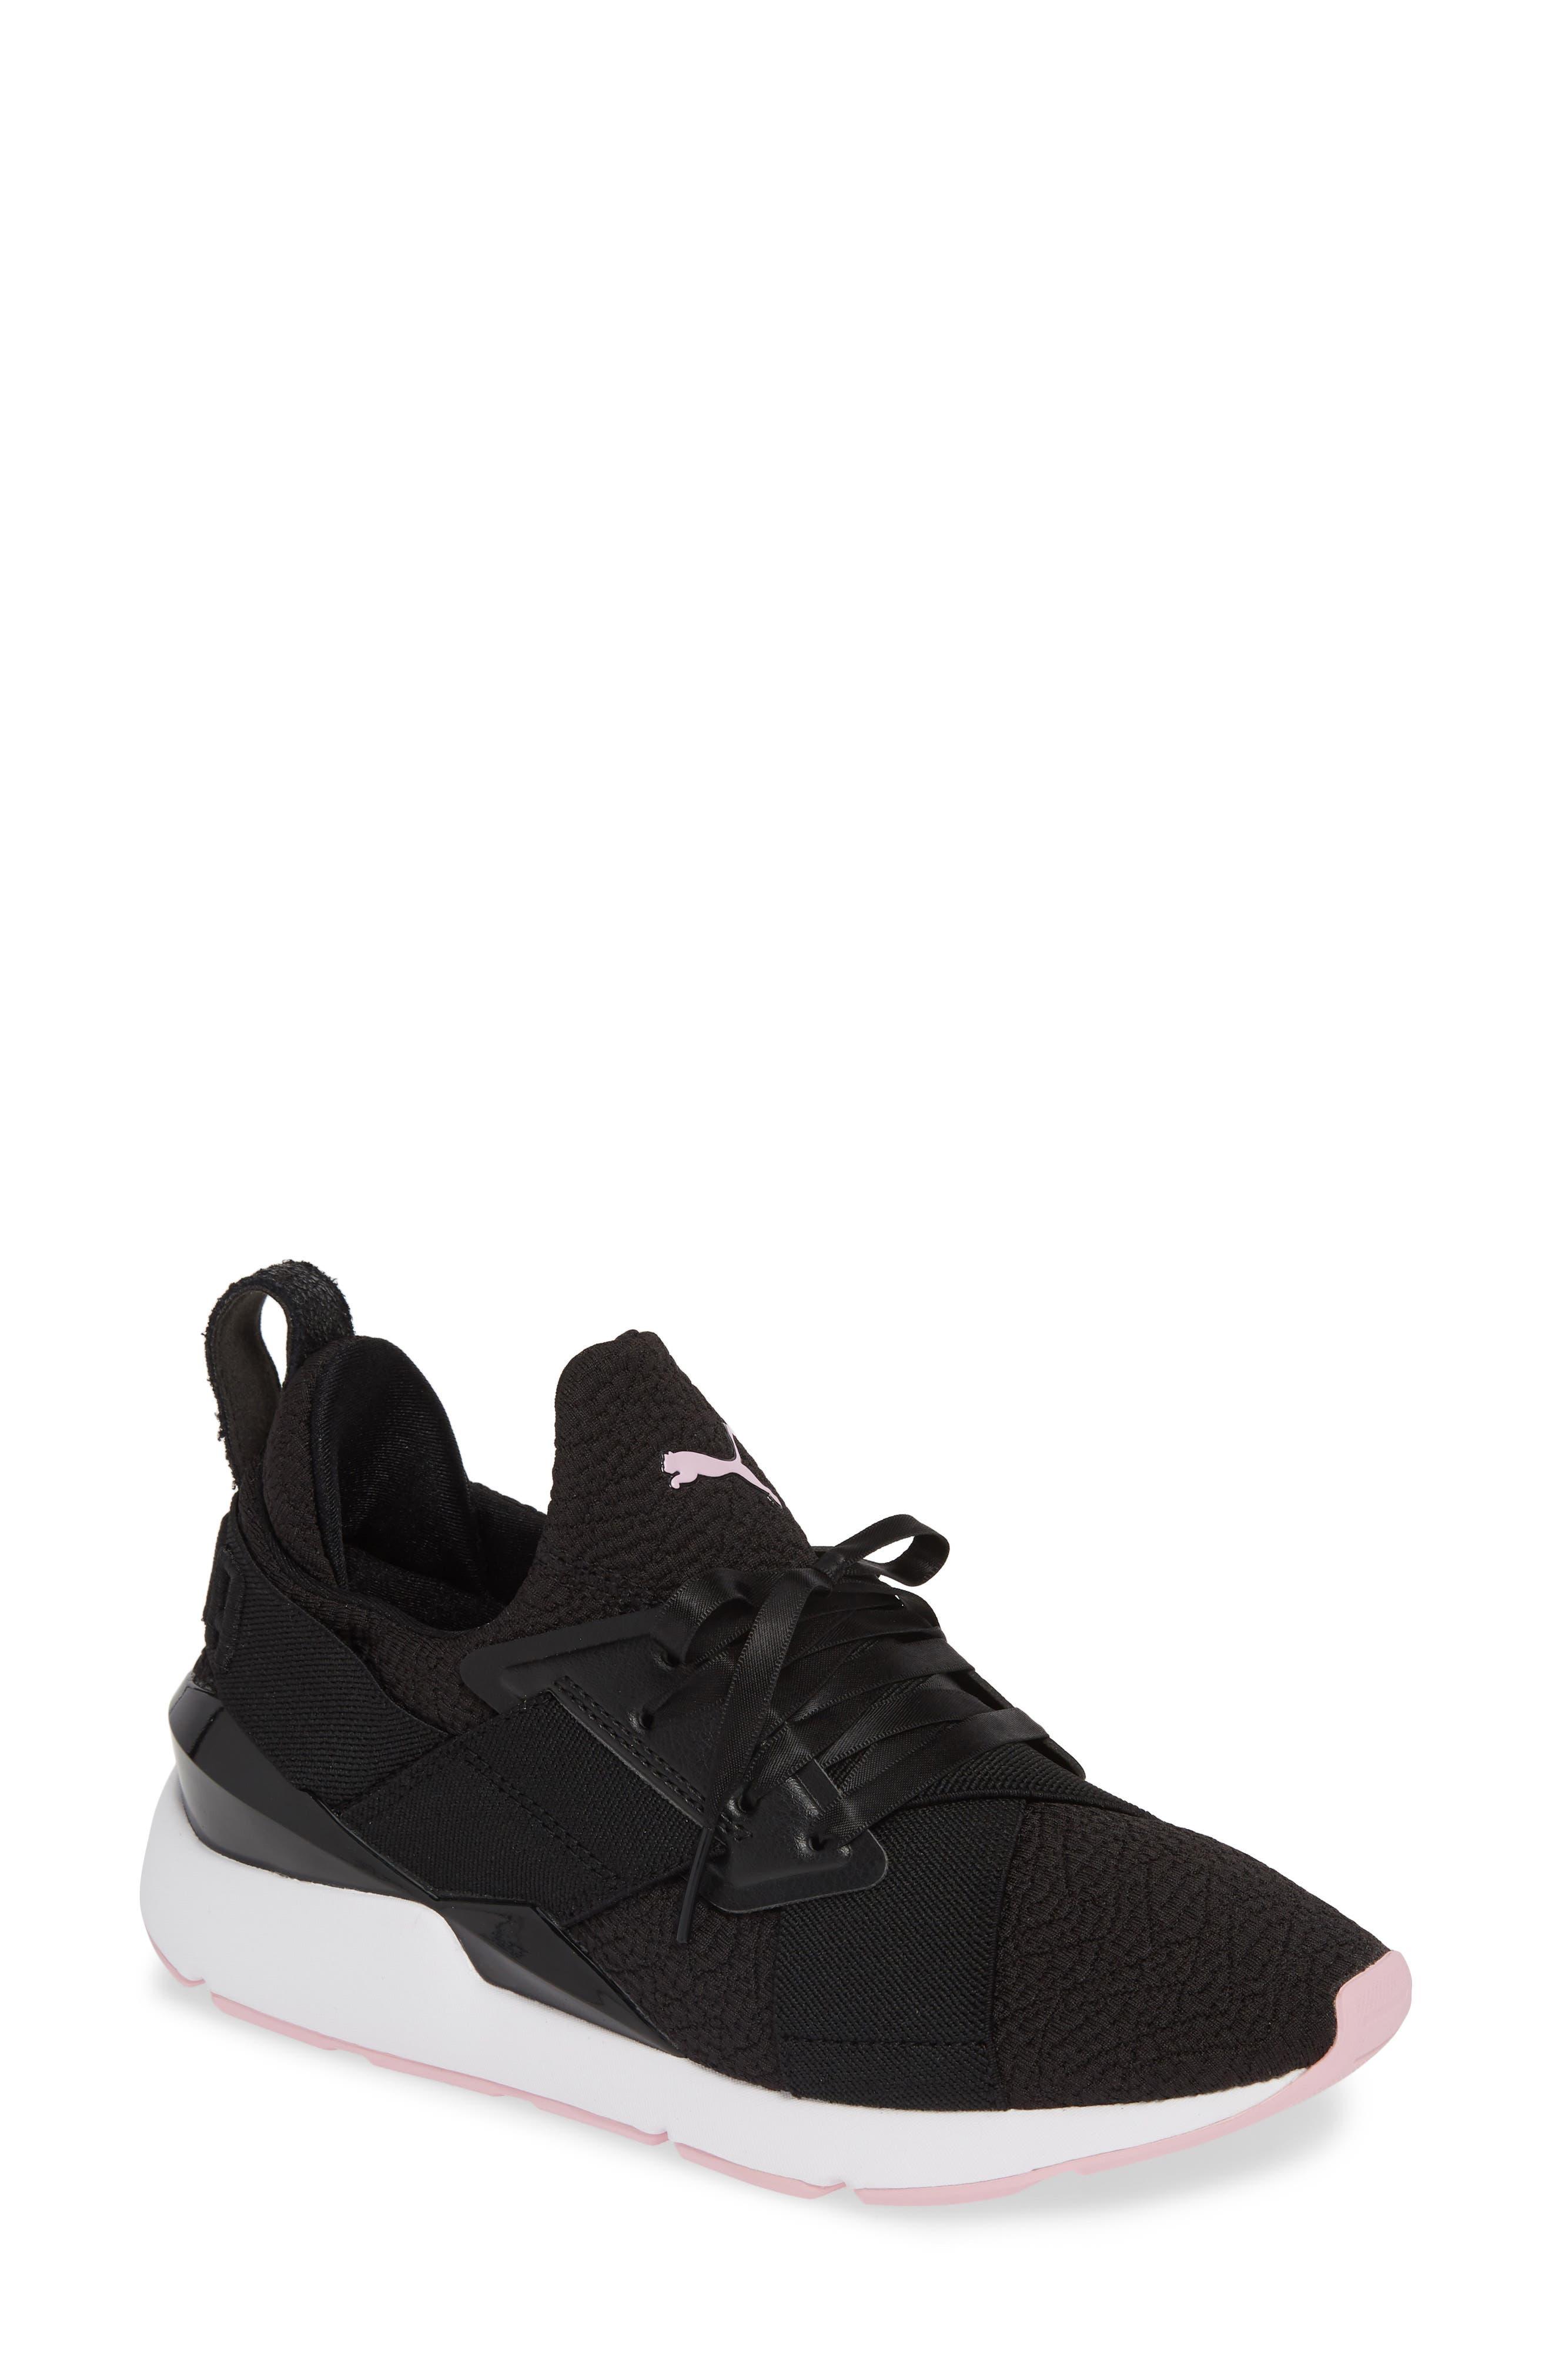 PUMA, Muse TZ Sneaker, Main thumbnail 1, color, BLACK/ PALE PINK